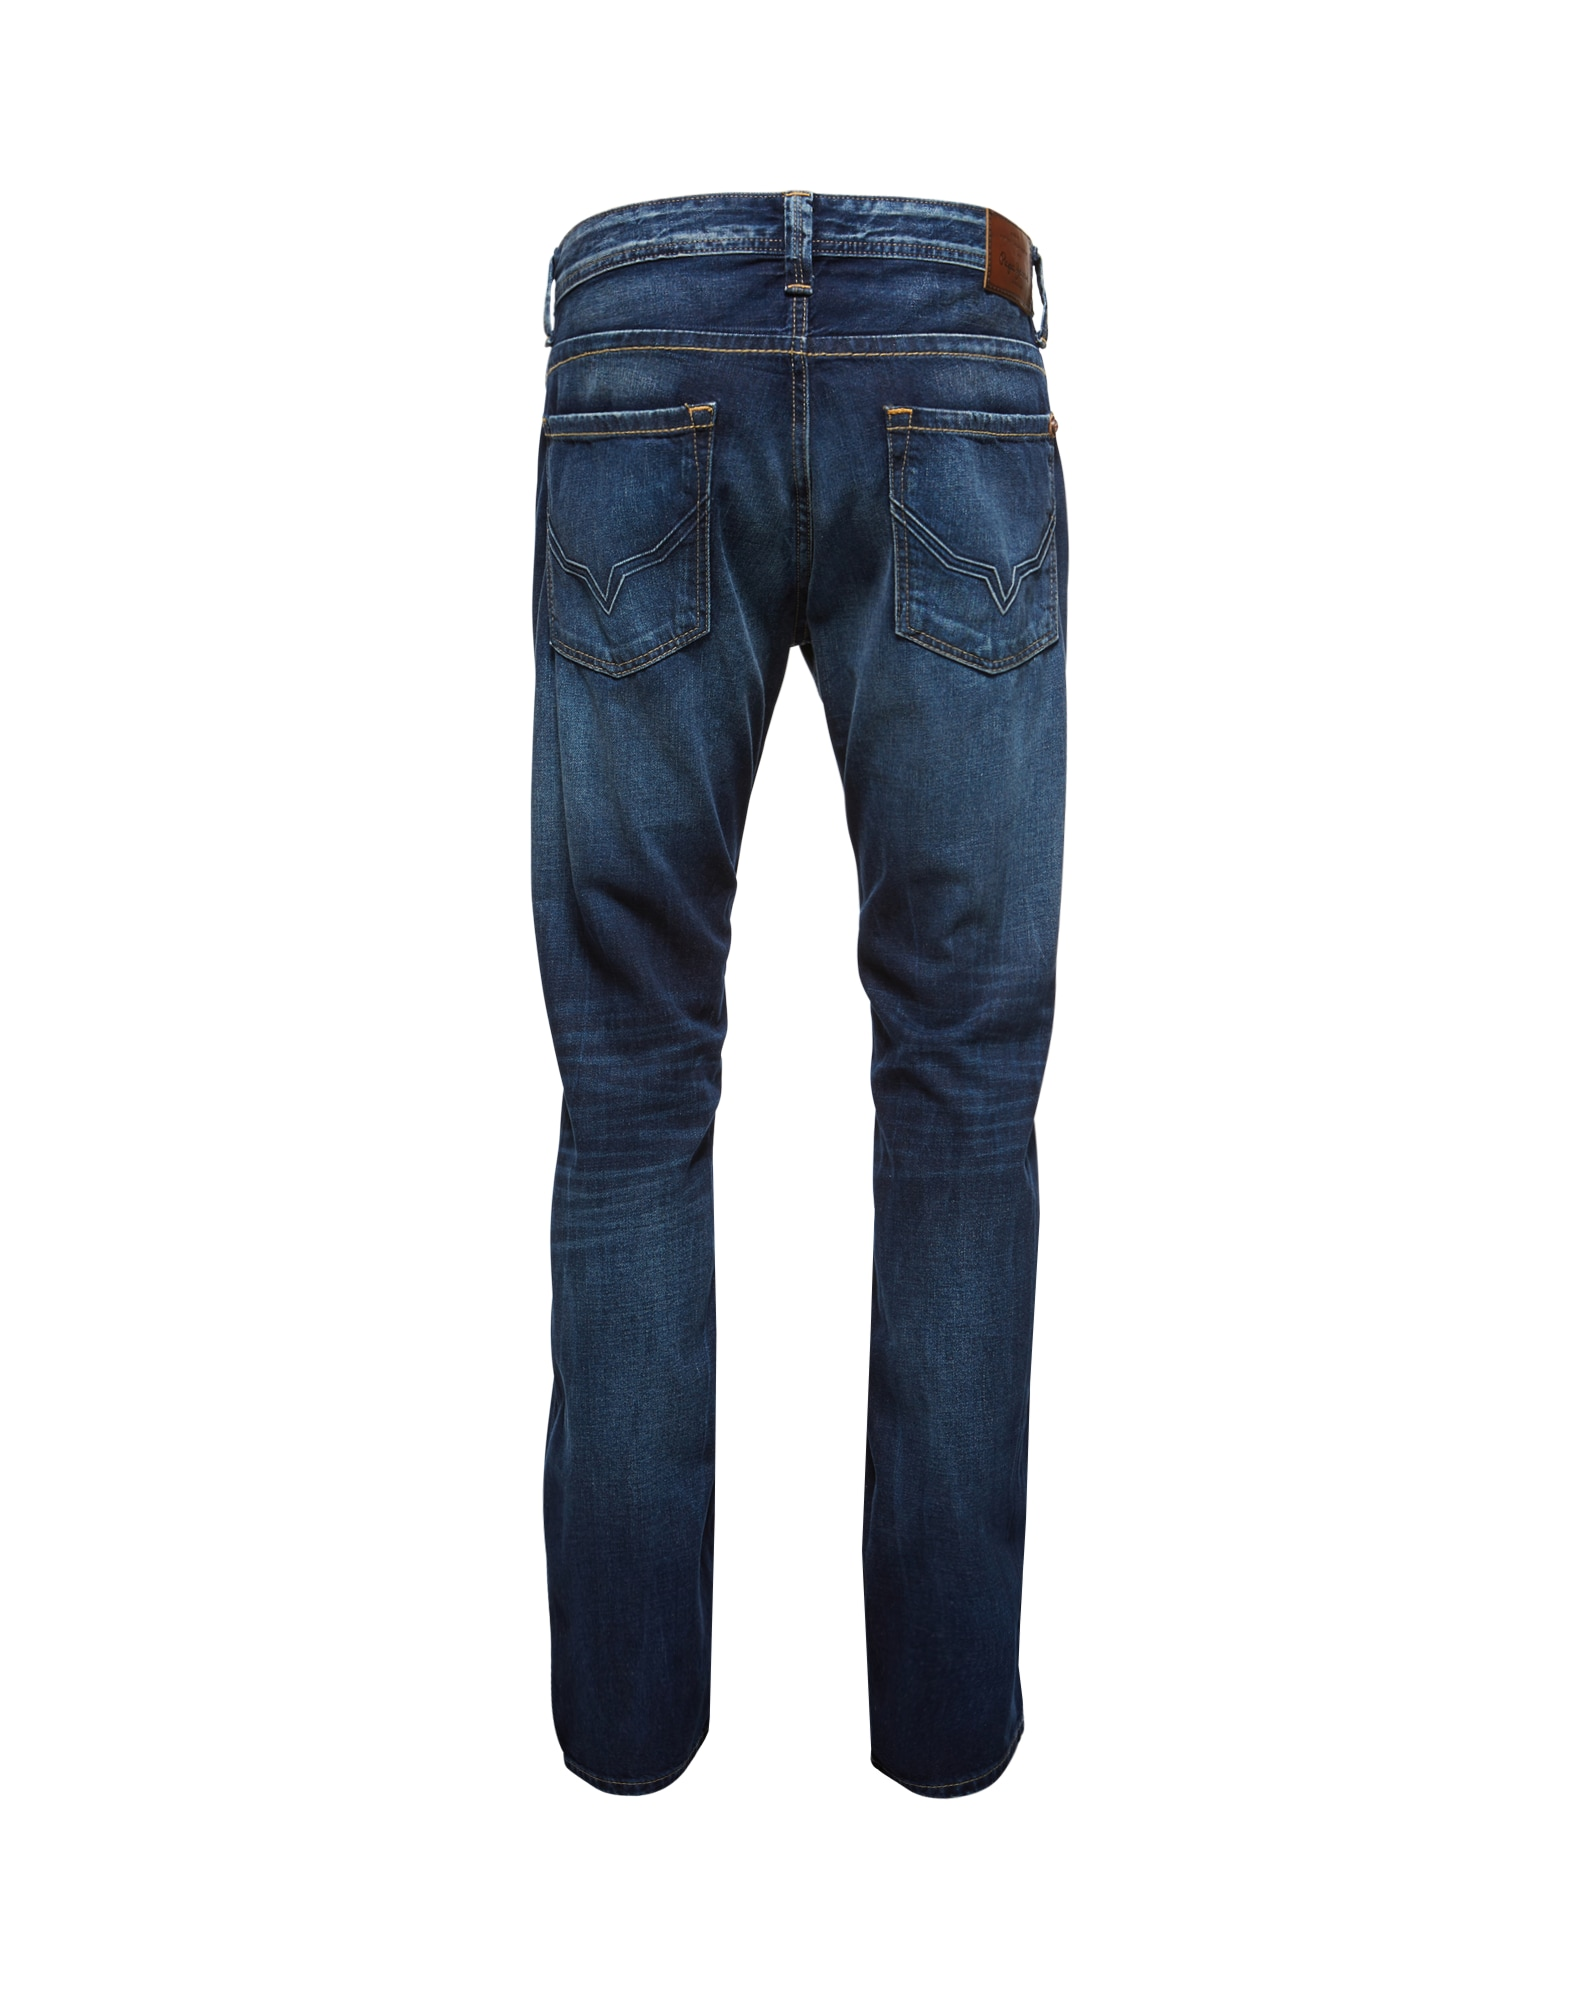 Pepe Jeans Jeans  blå denim